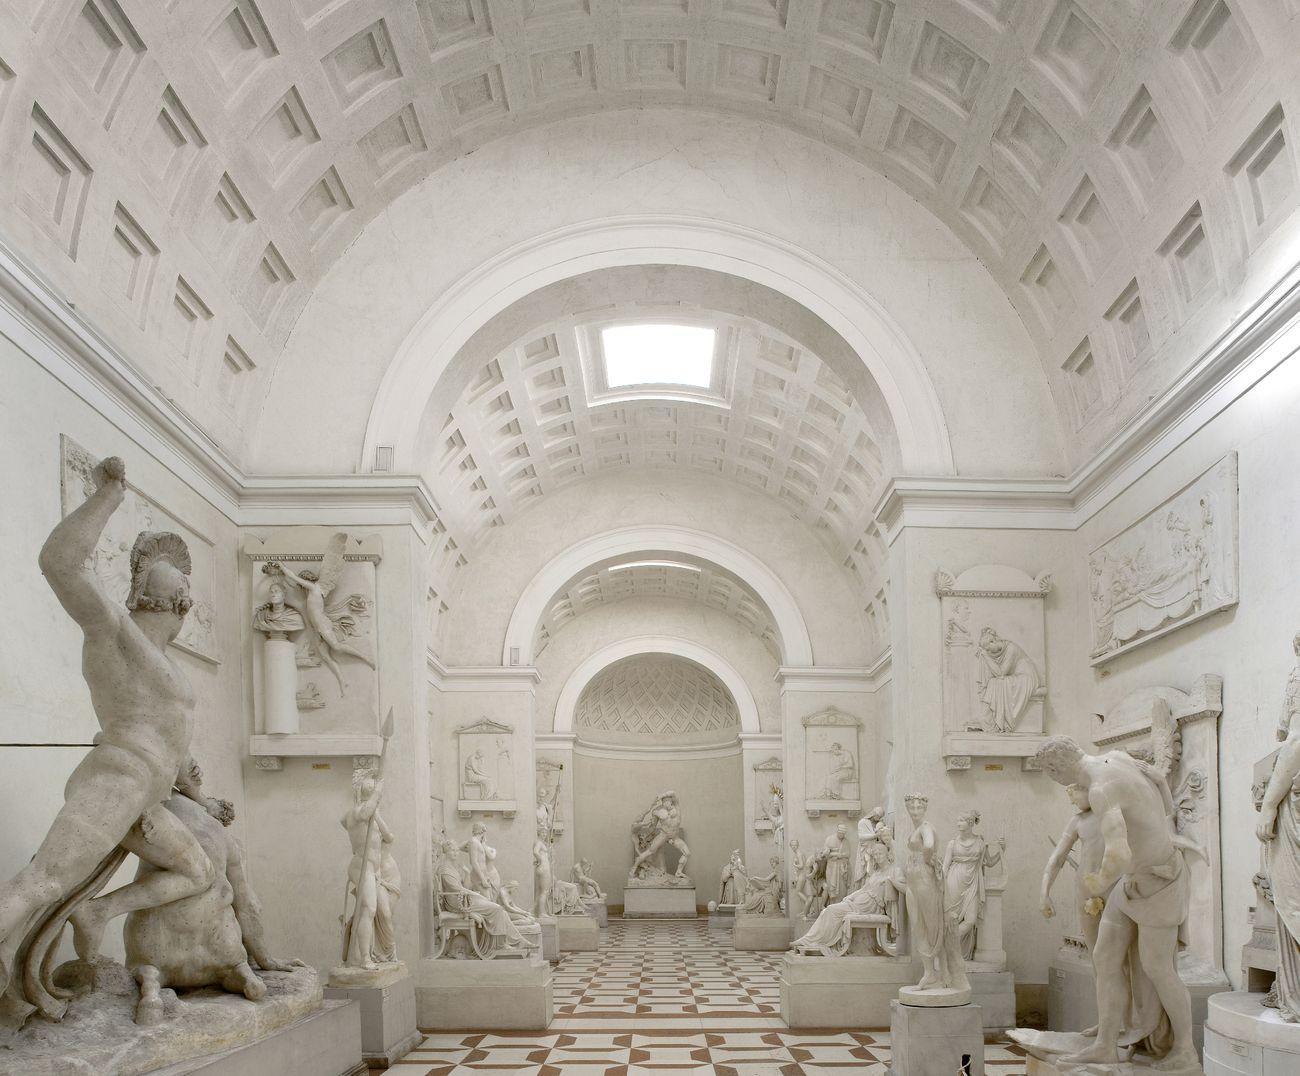 Gipsoteca e Museo Antonio Canova, Ala Ottocentesca, Possagno